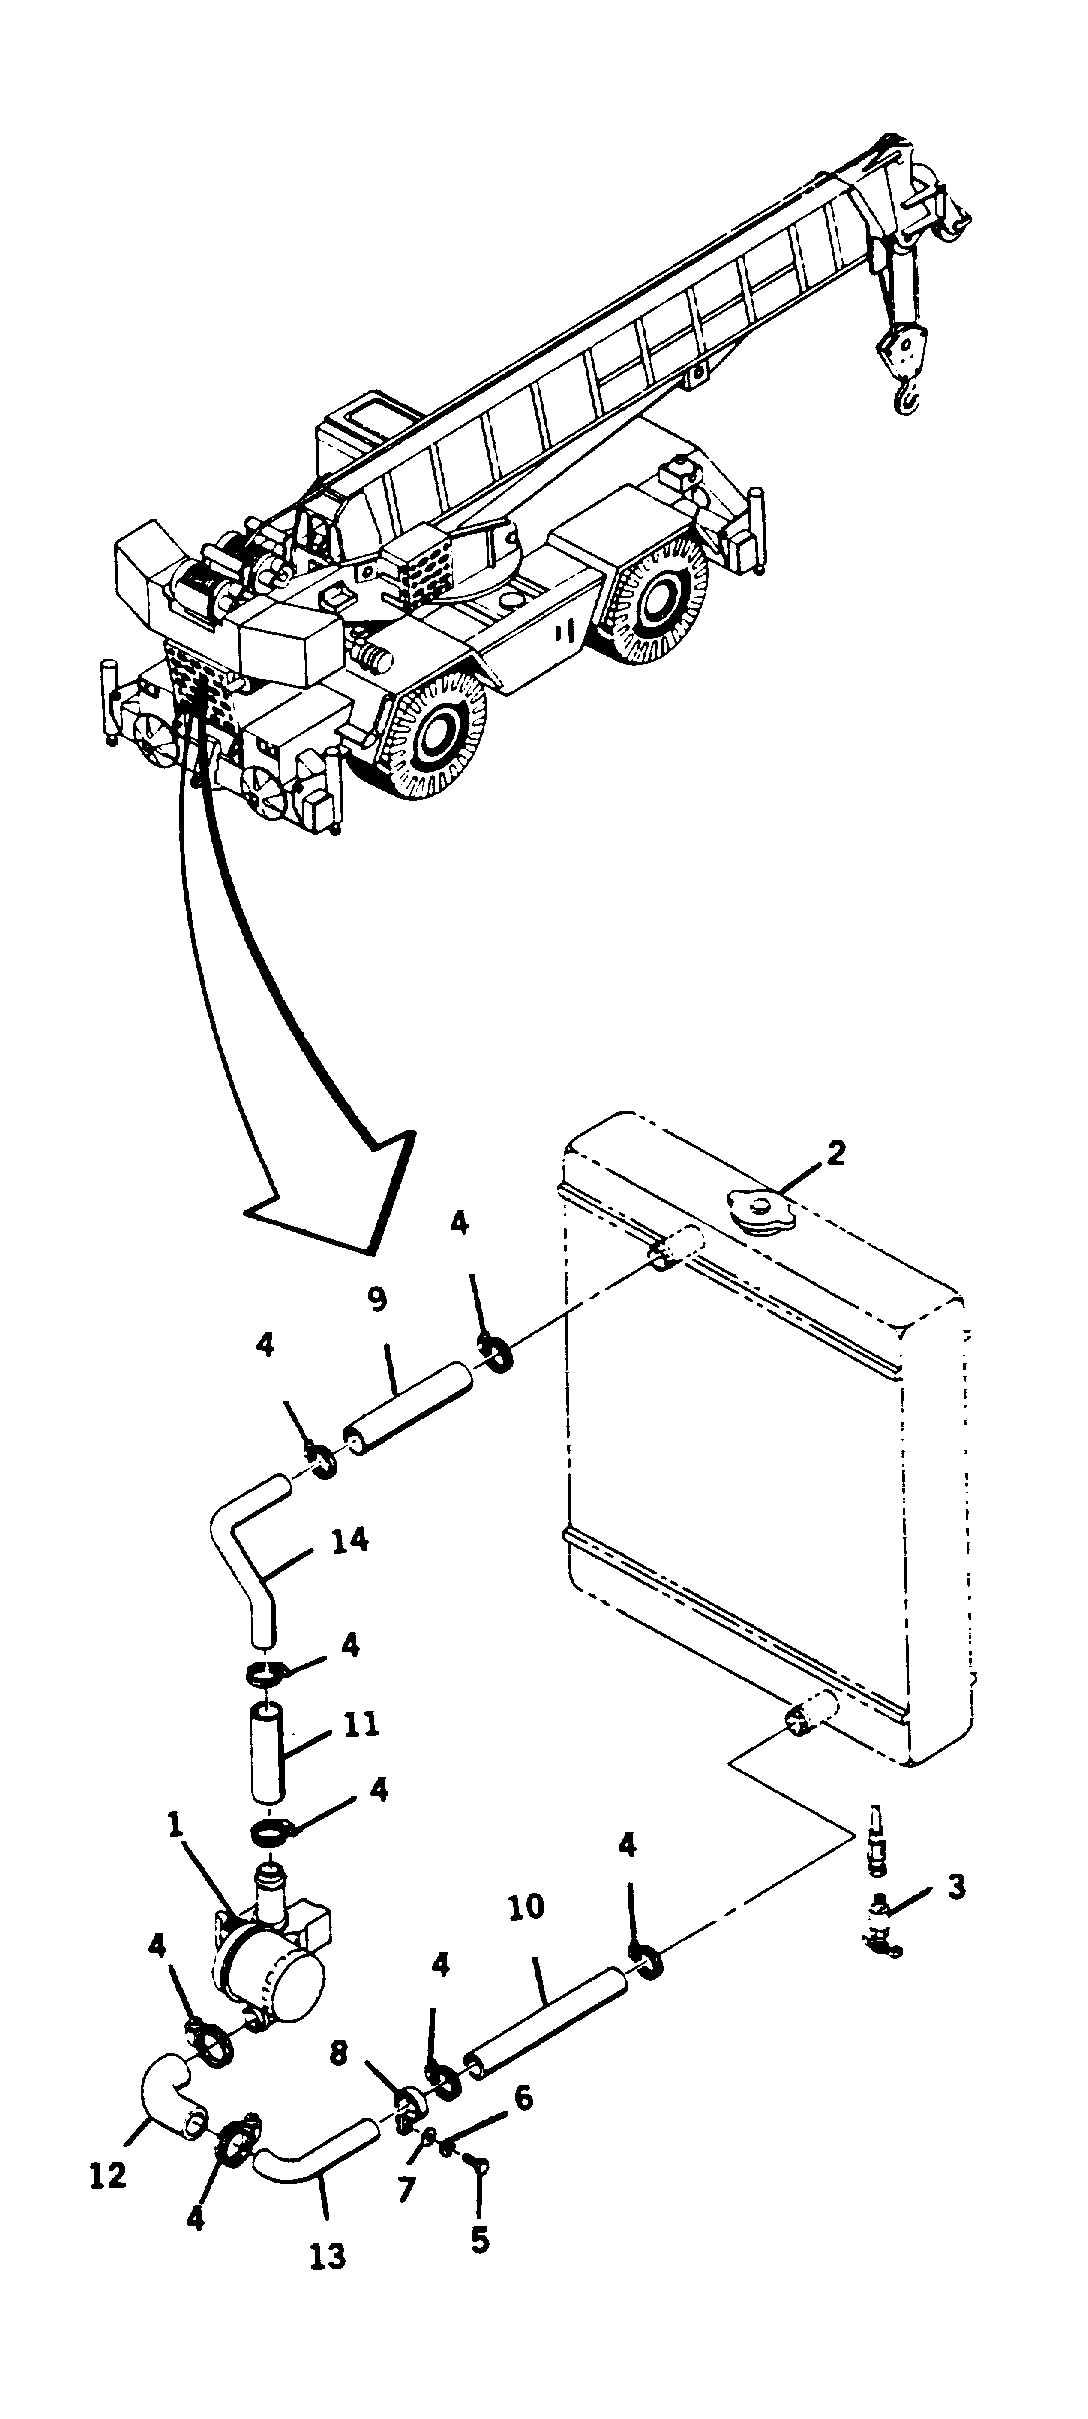 Radiator Fan And Fan Guard Replacement